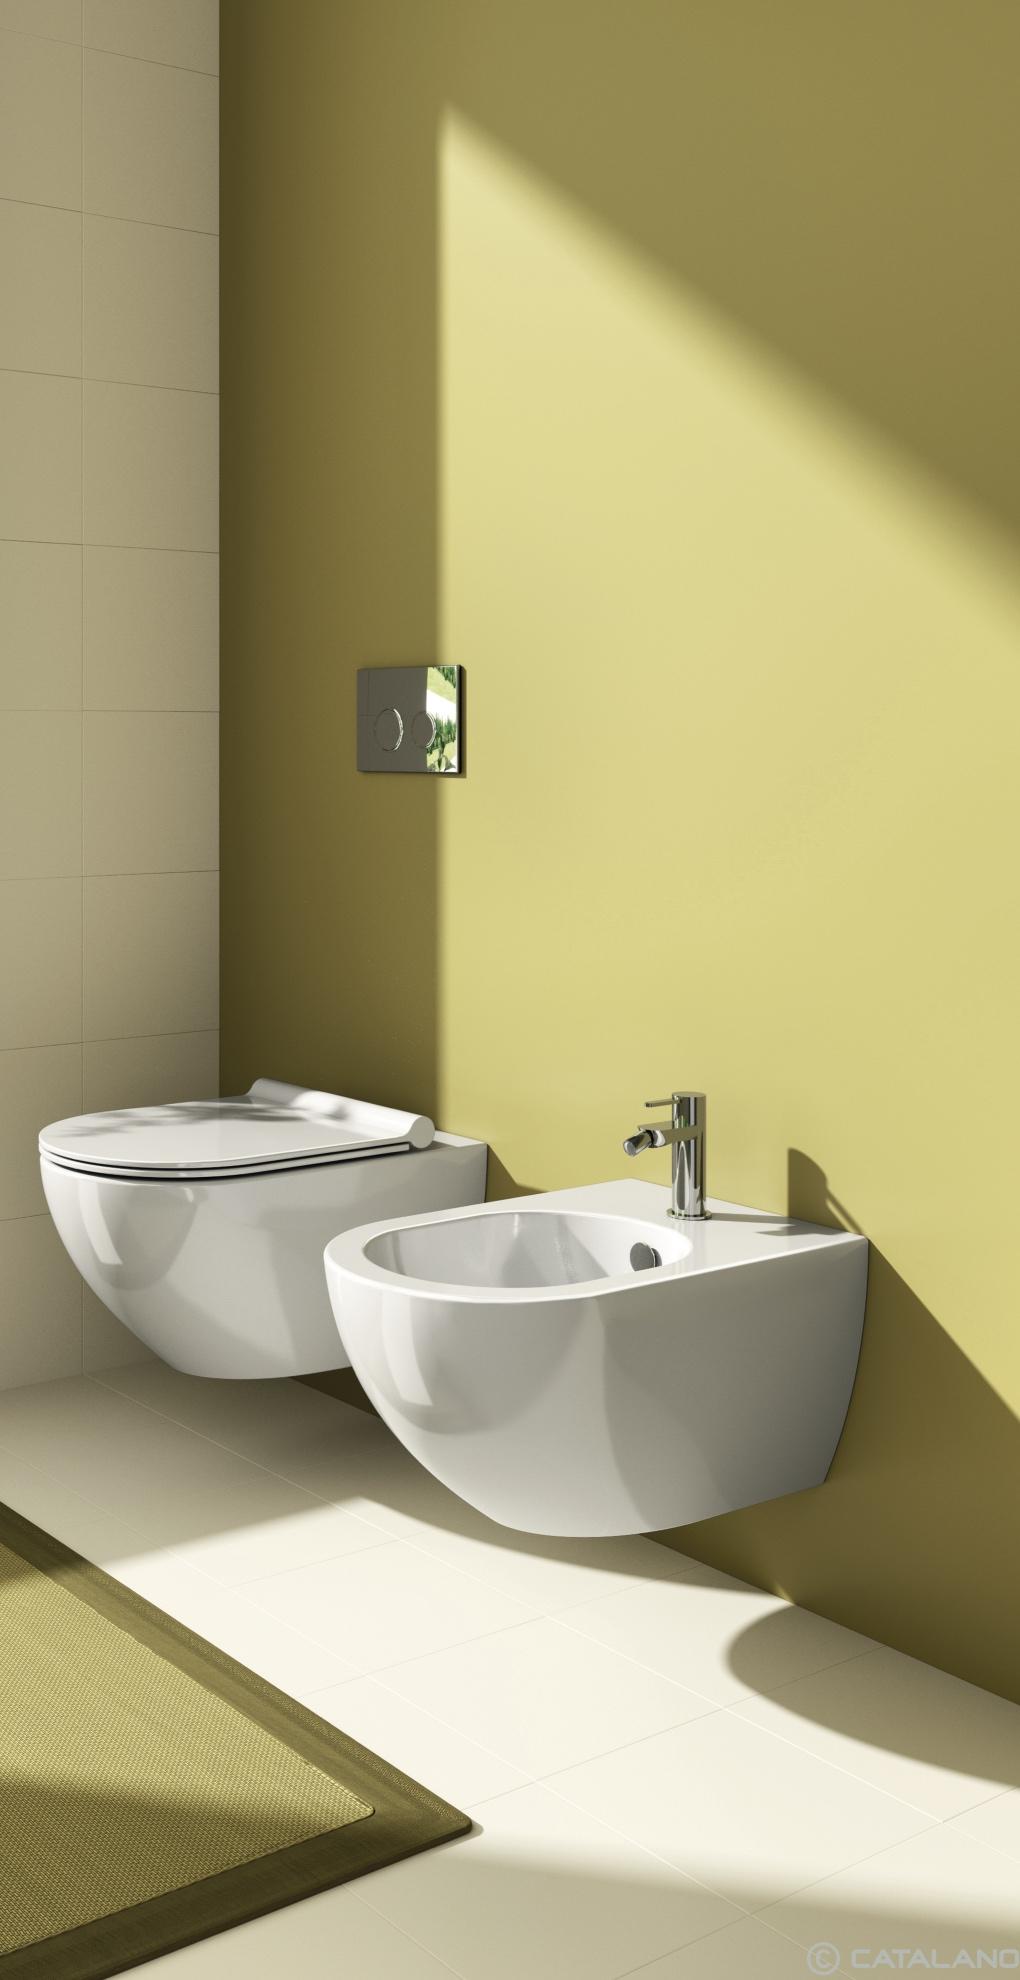 Catalano Sfera 54 Newflush WC toilet bidet væghængt cataglaze nf